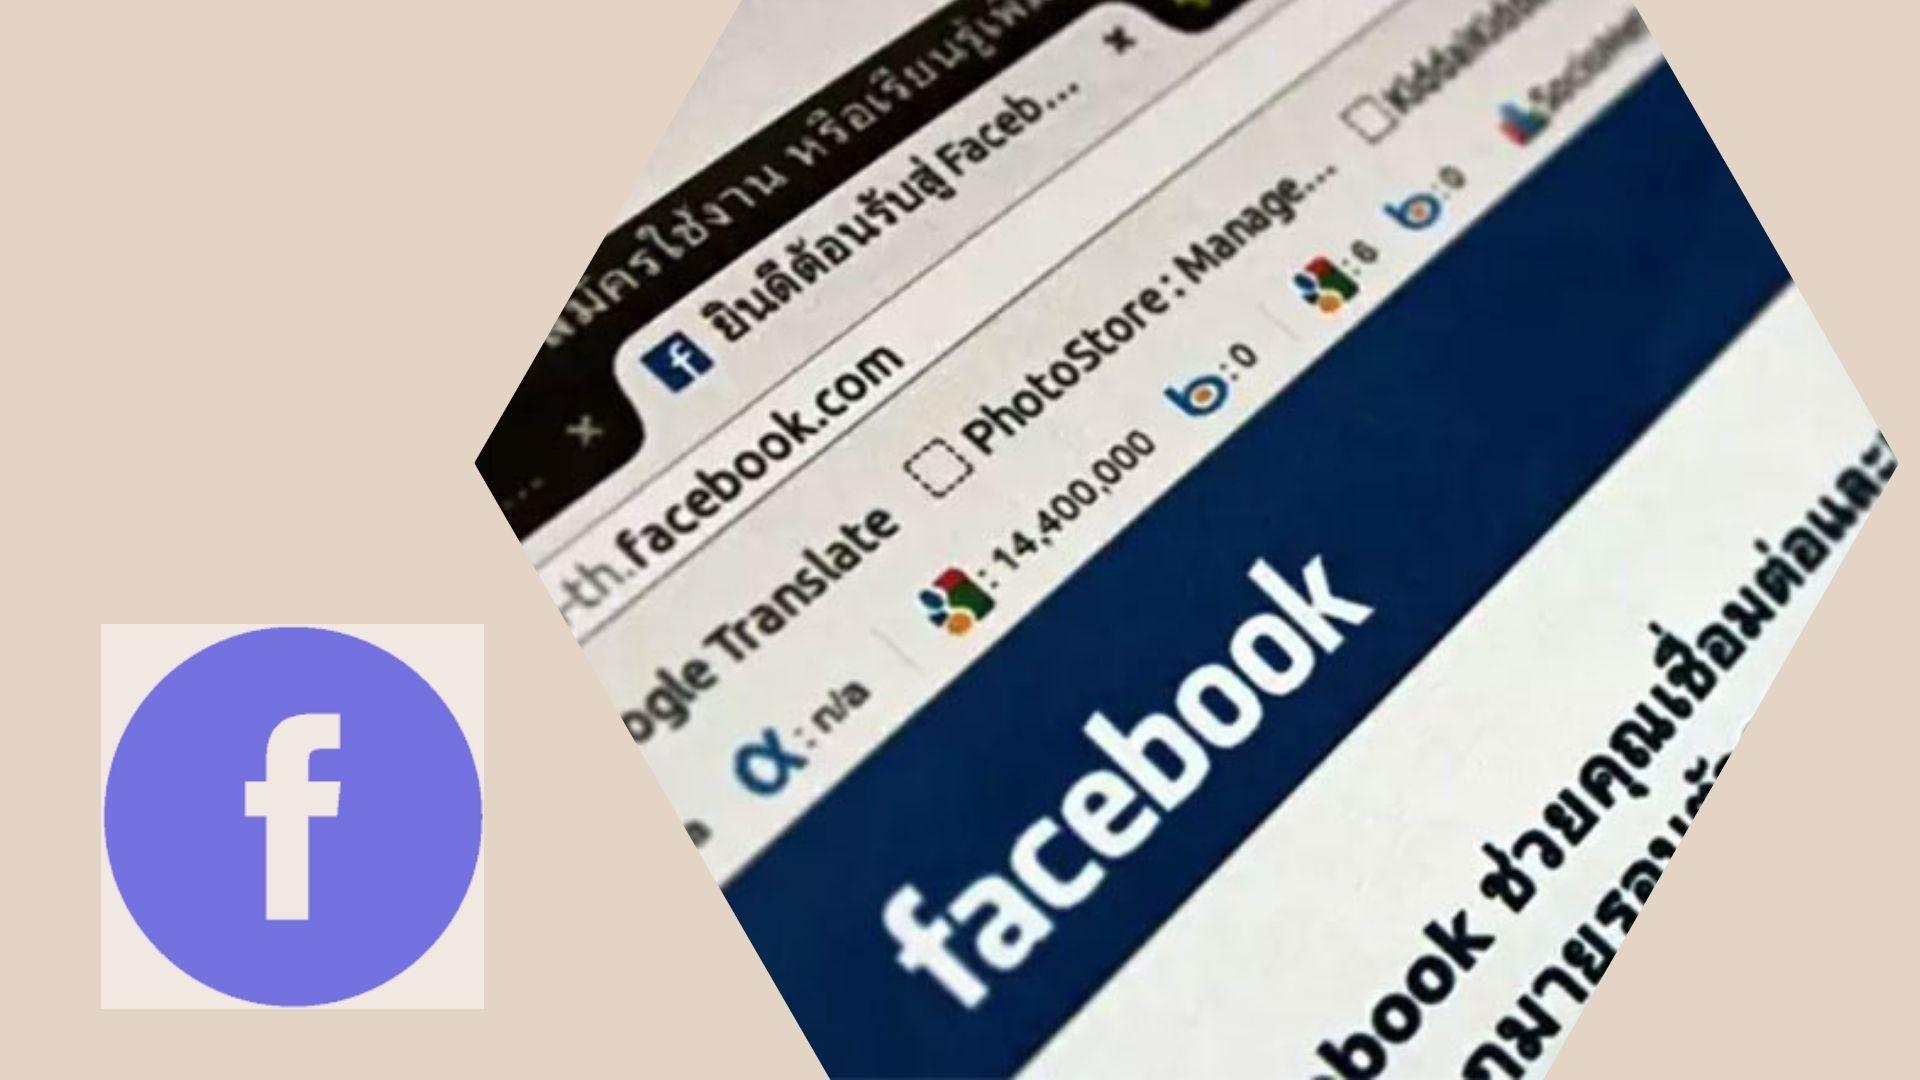 facebook user data leakage